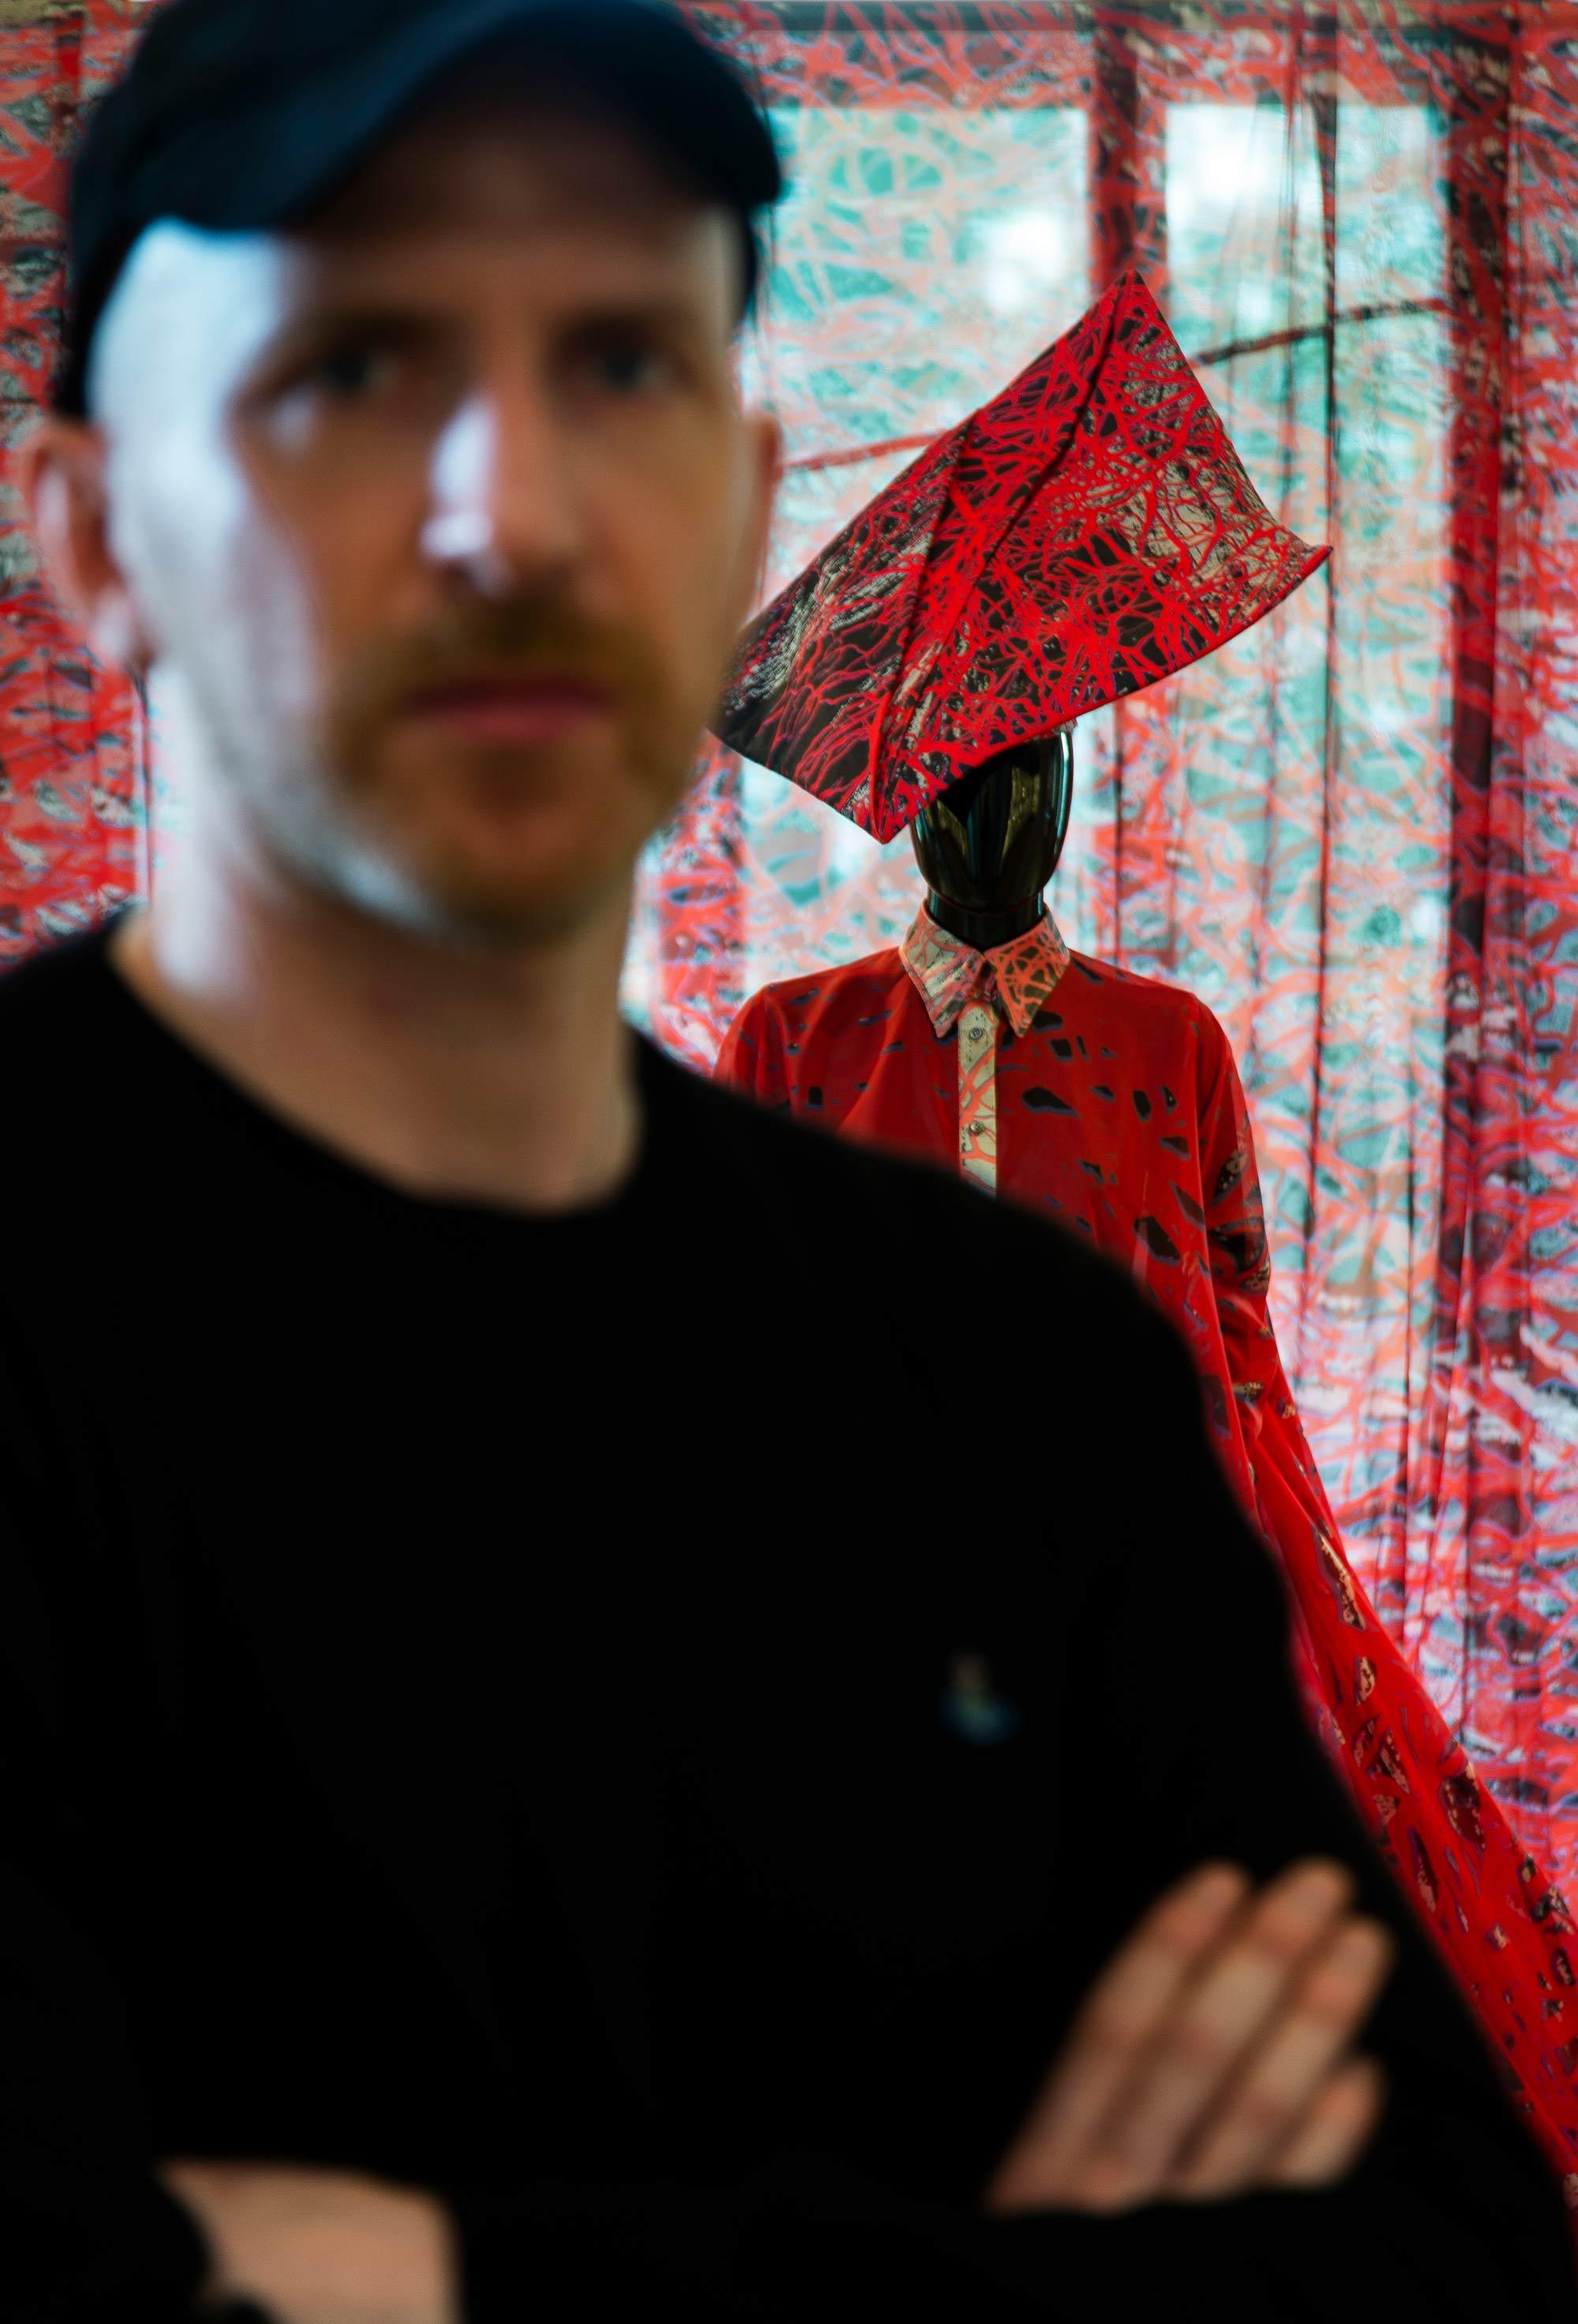 Martin-bergstrom-arty-farty-nationalmuseum3.jpg